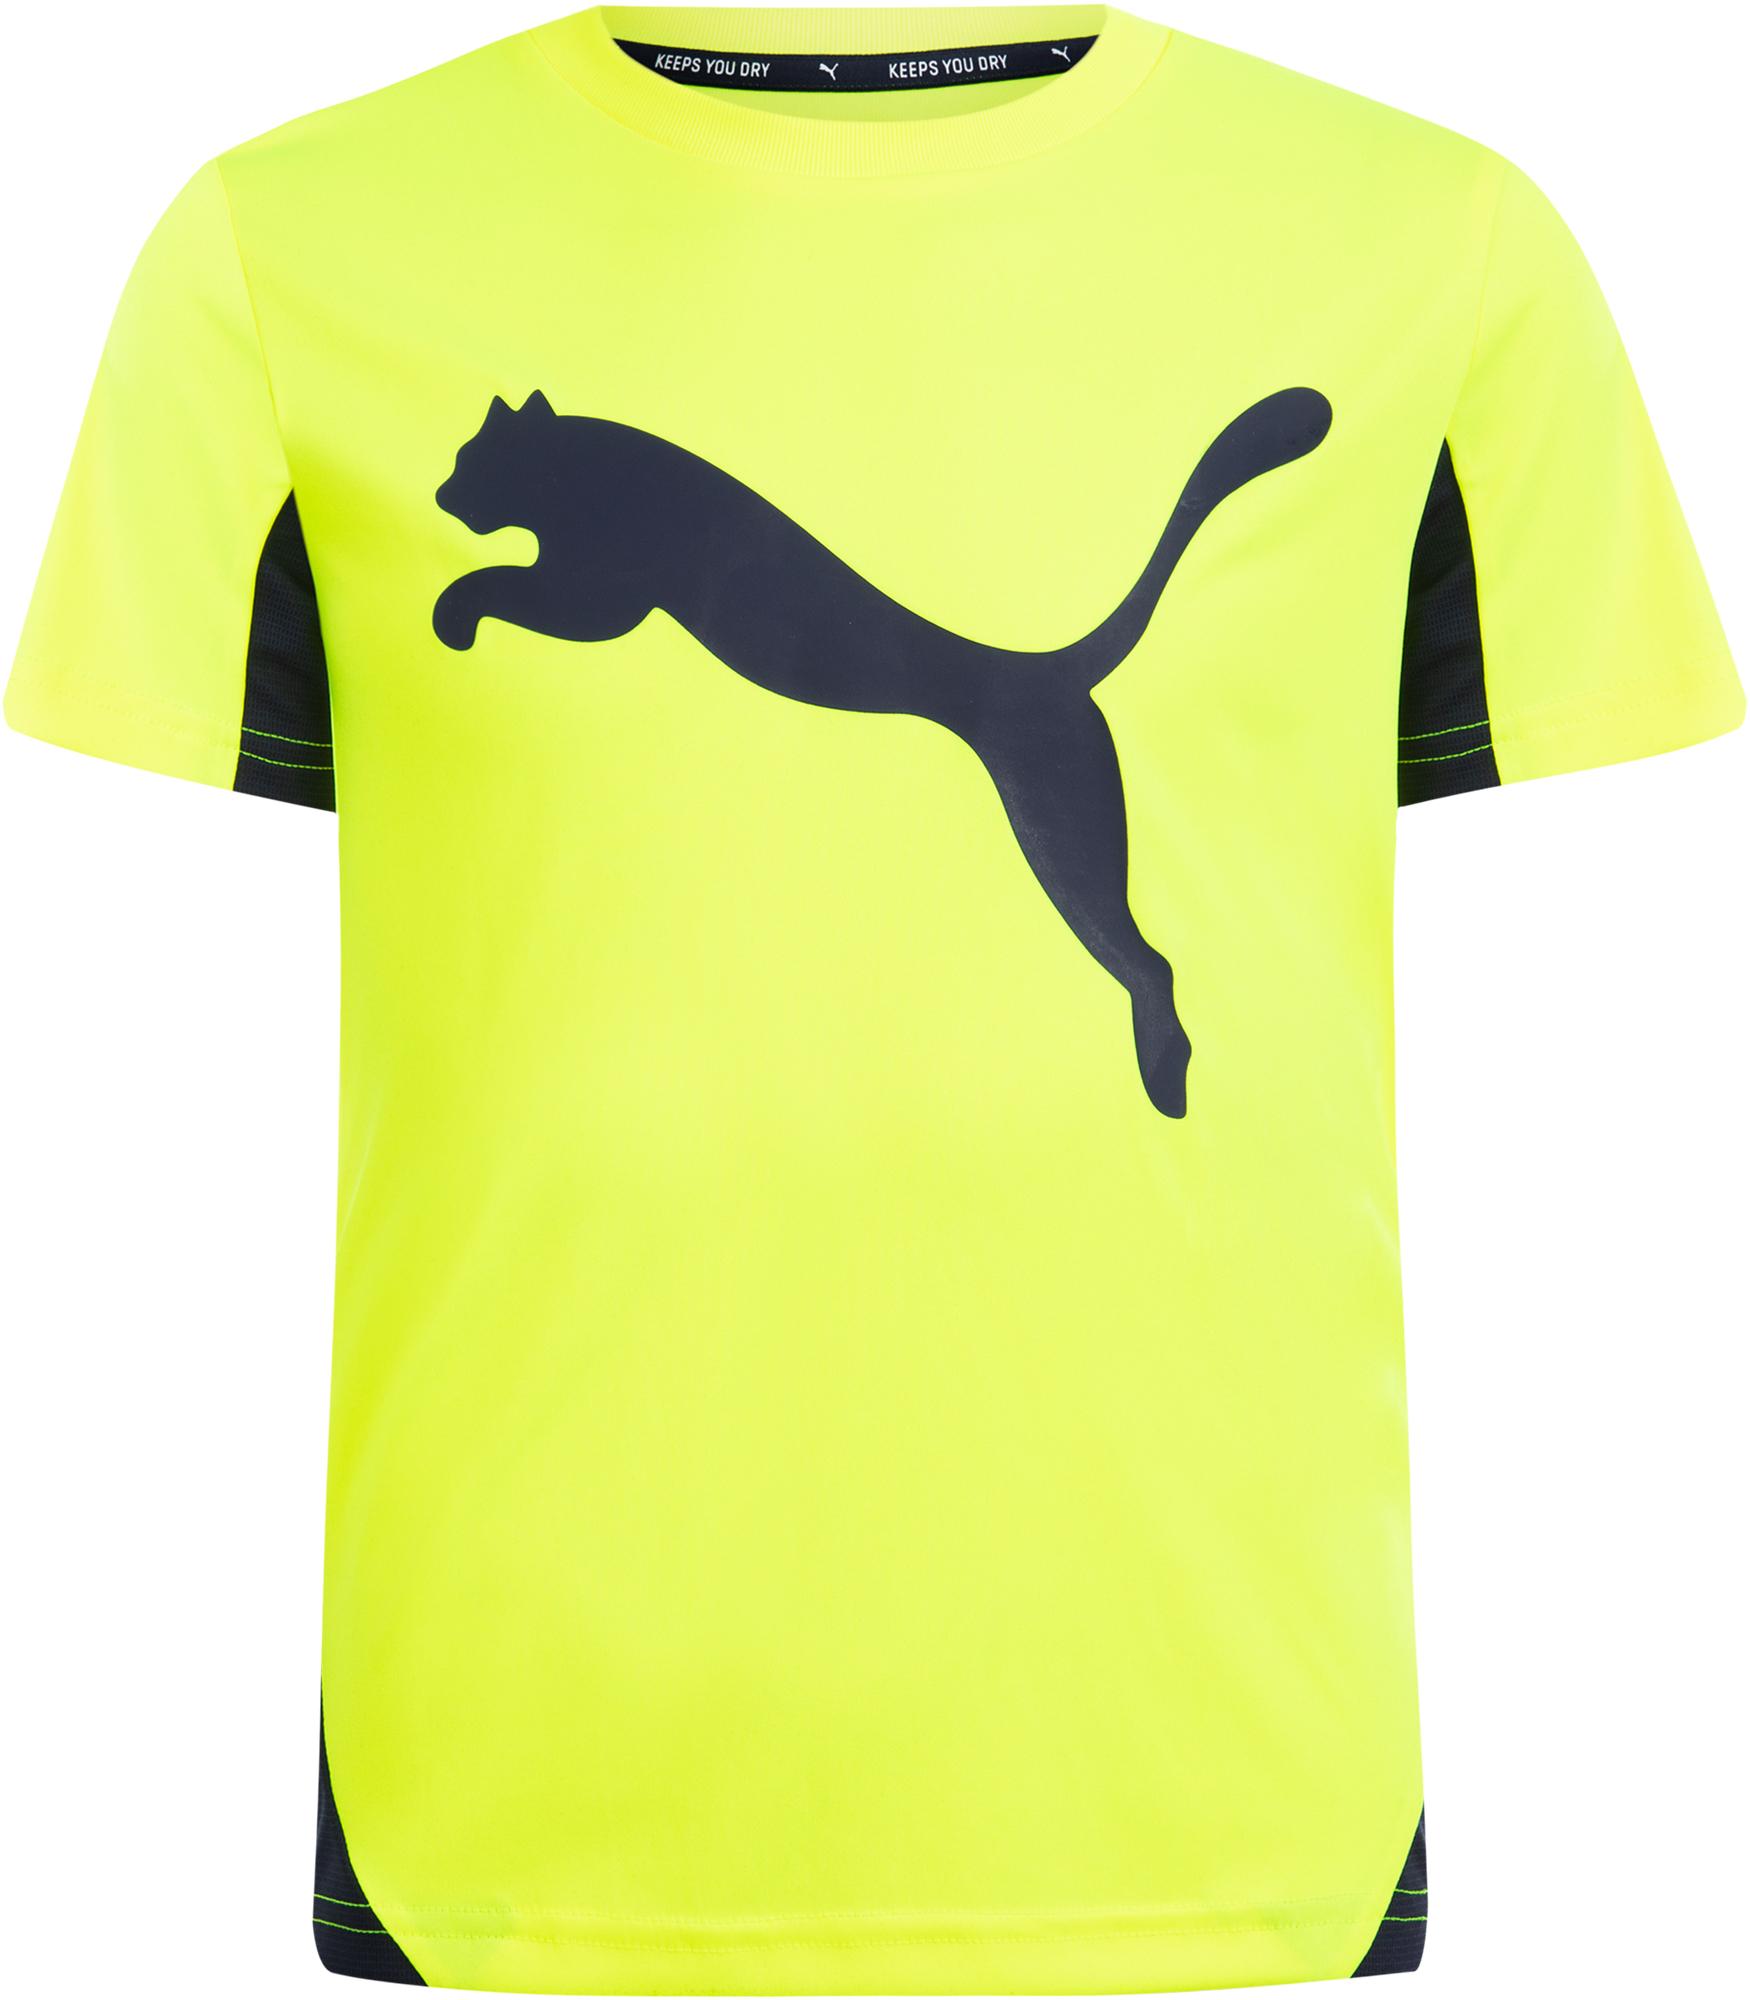 цена на Puma Футболка для мальчиков Puma, размер 164